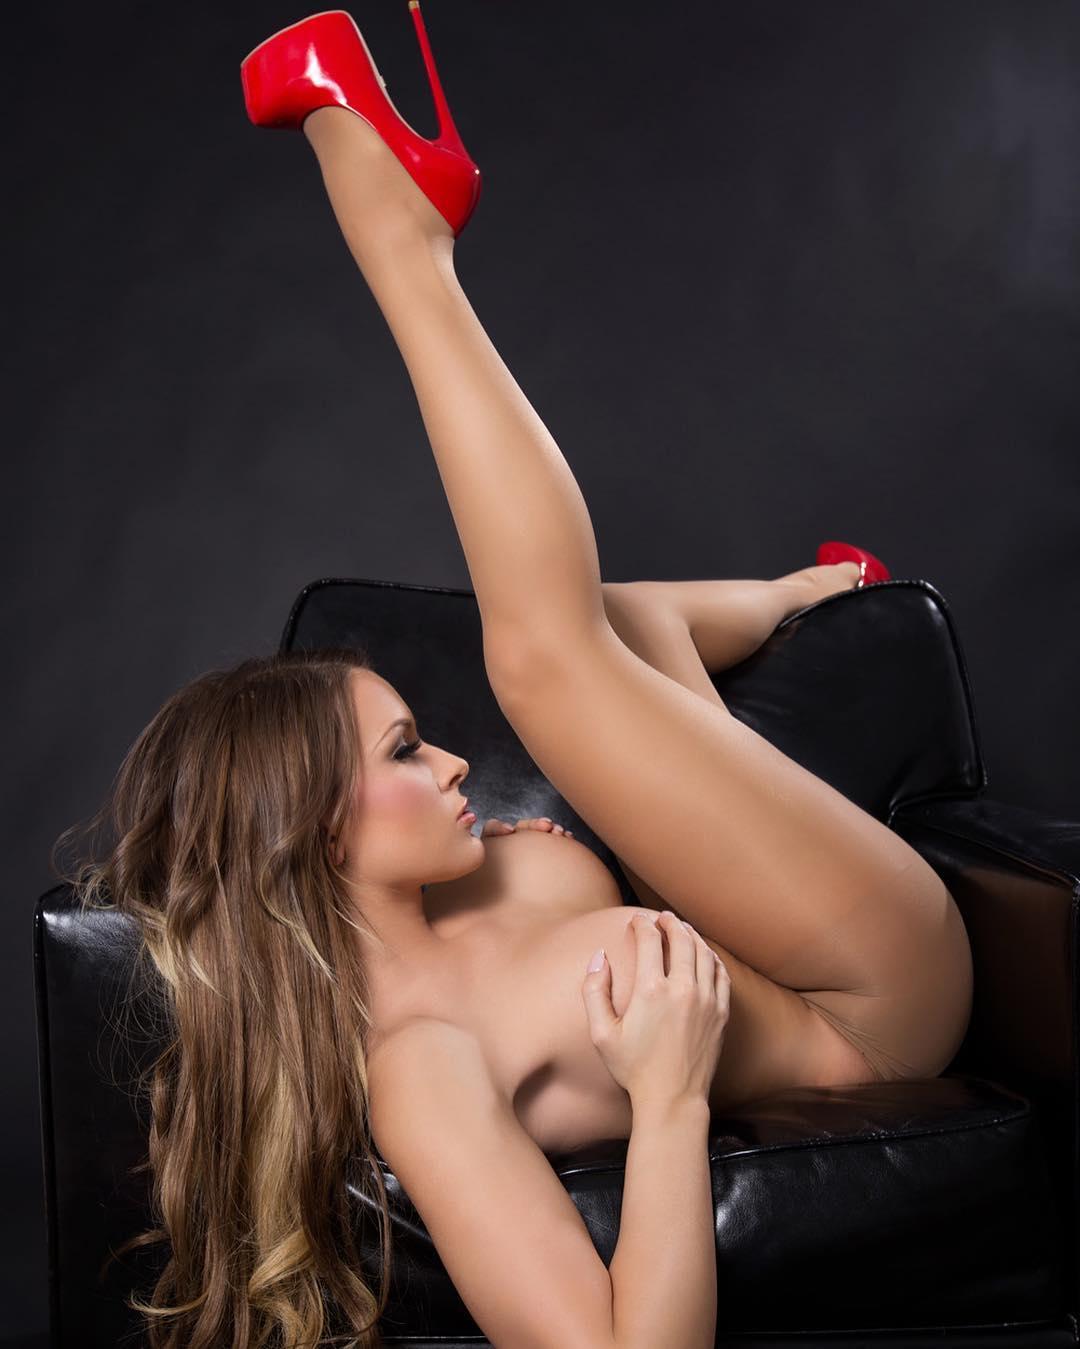 Naked Girls In High Heels